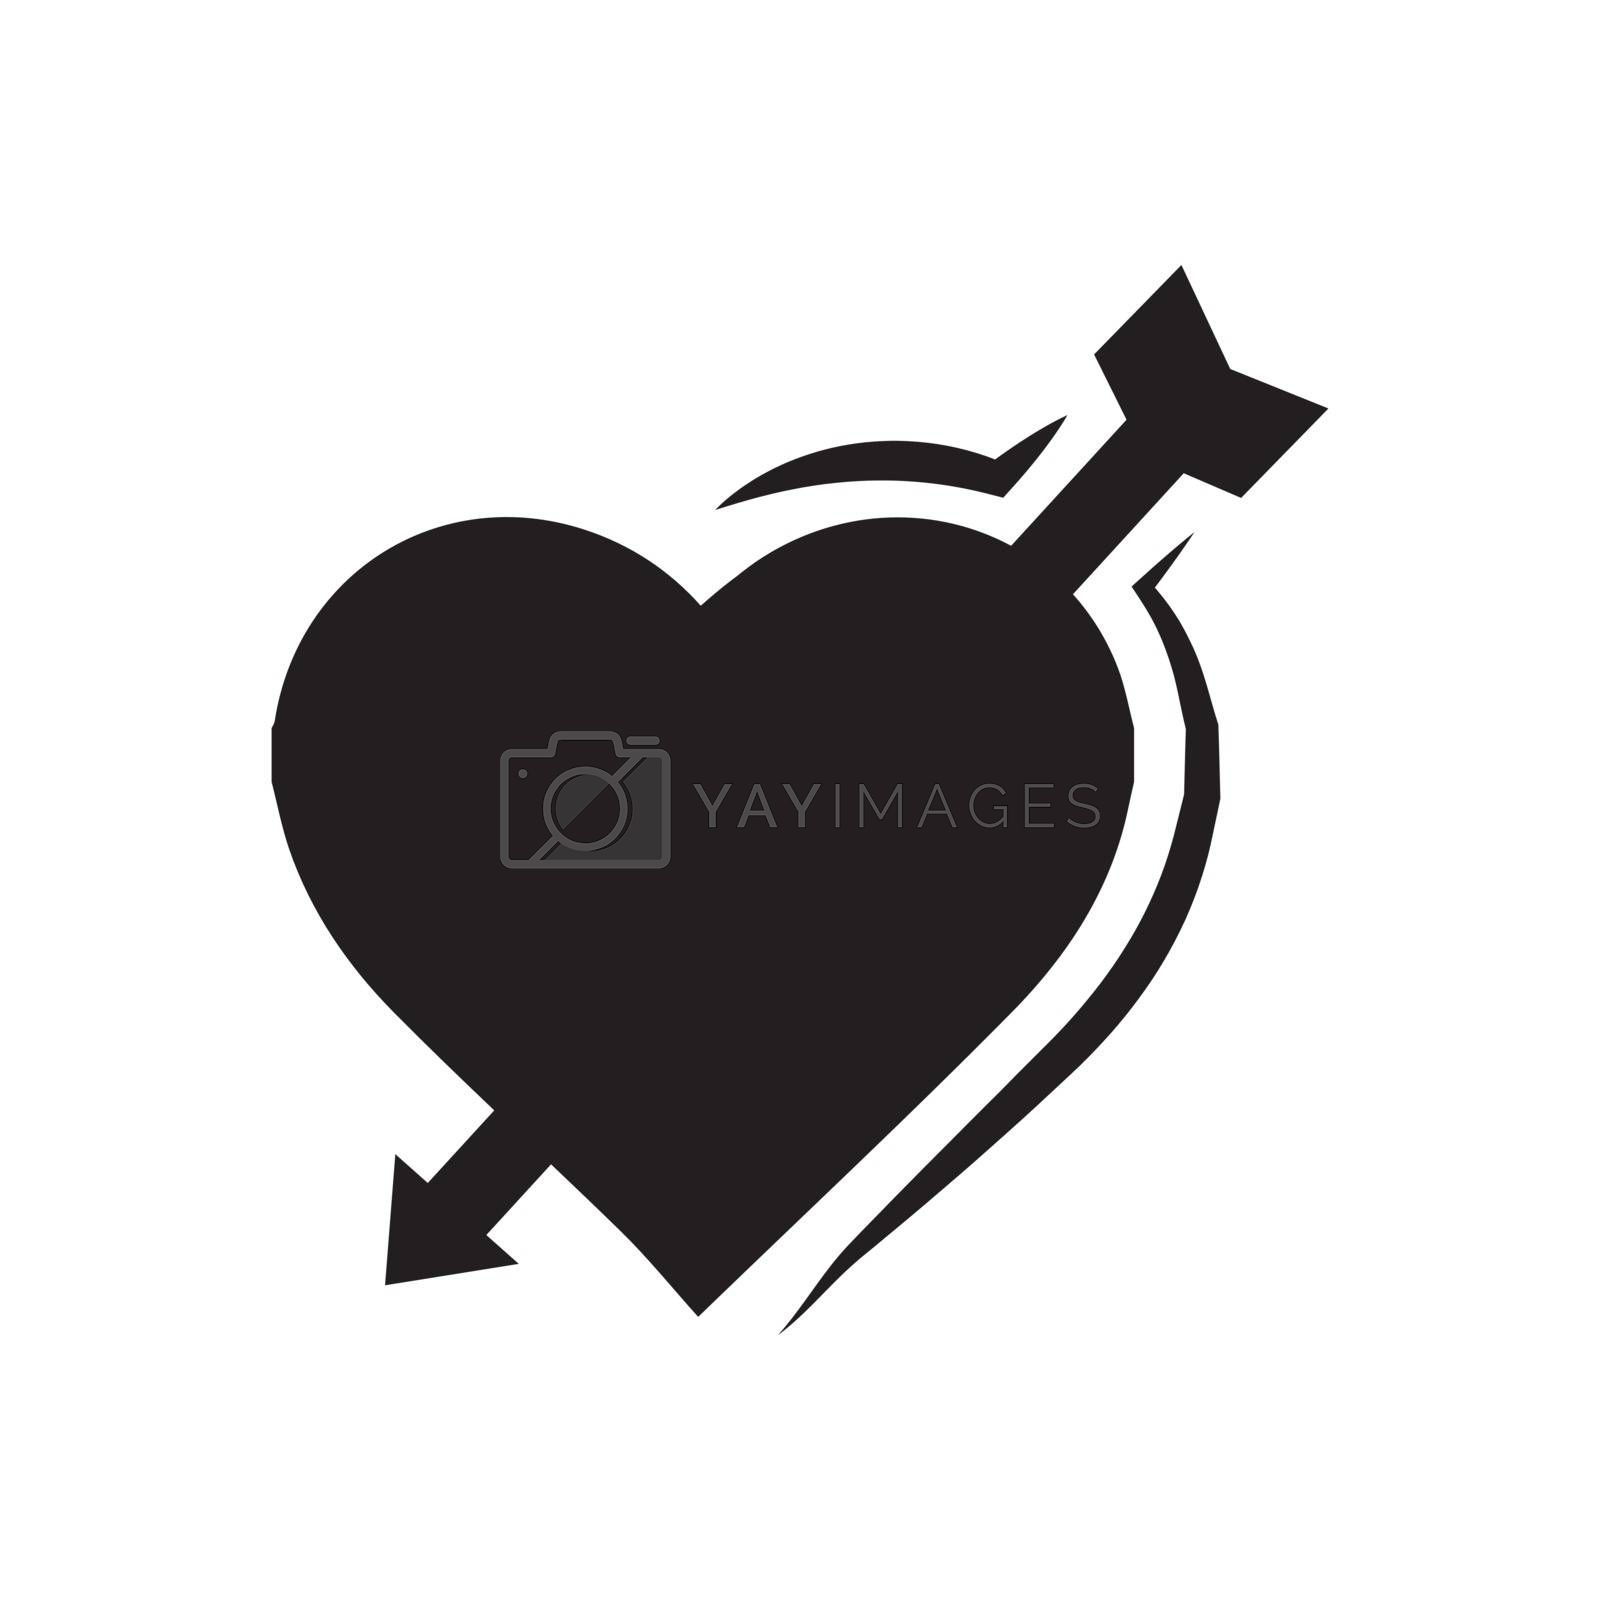 valentines heart arrow black icon